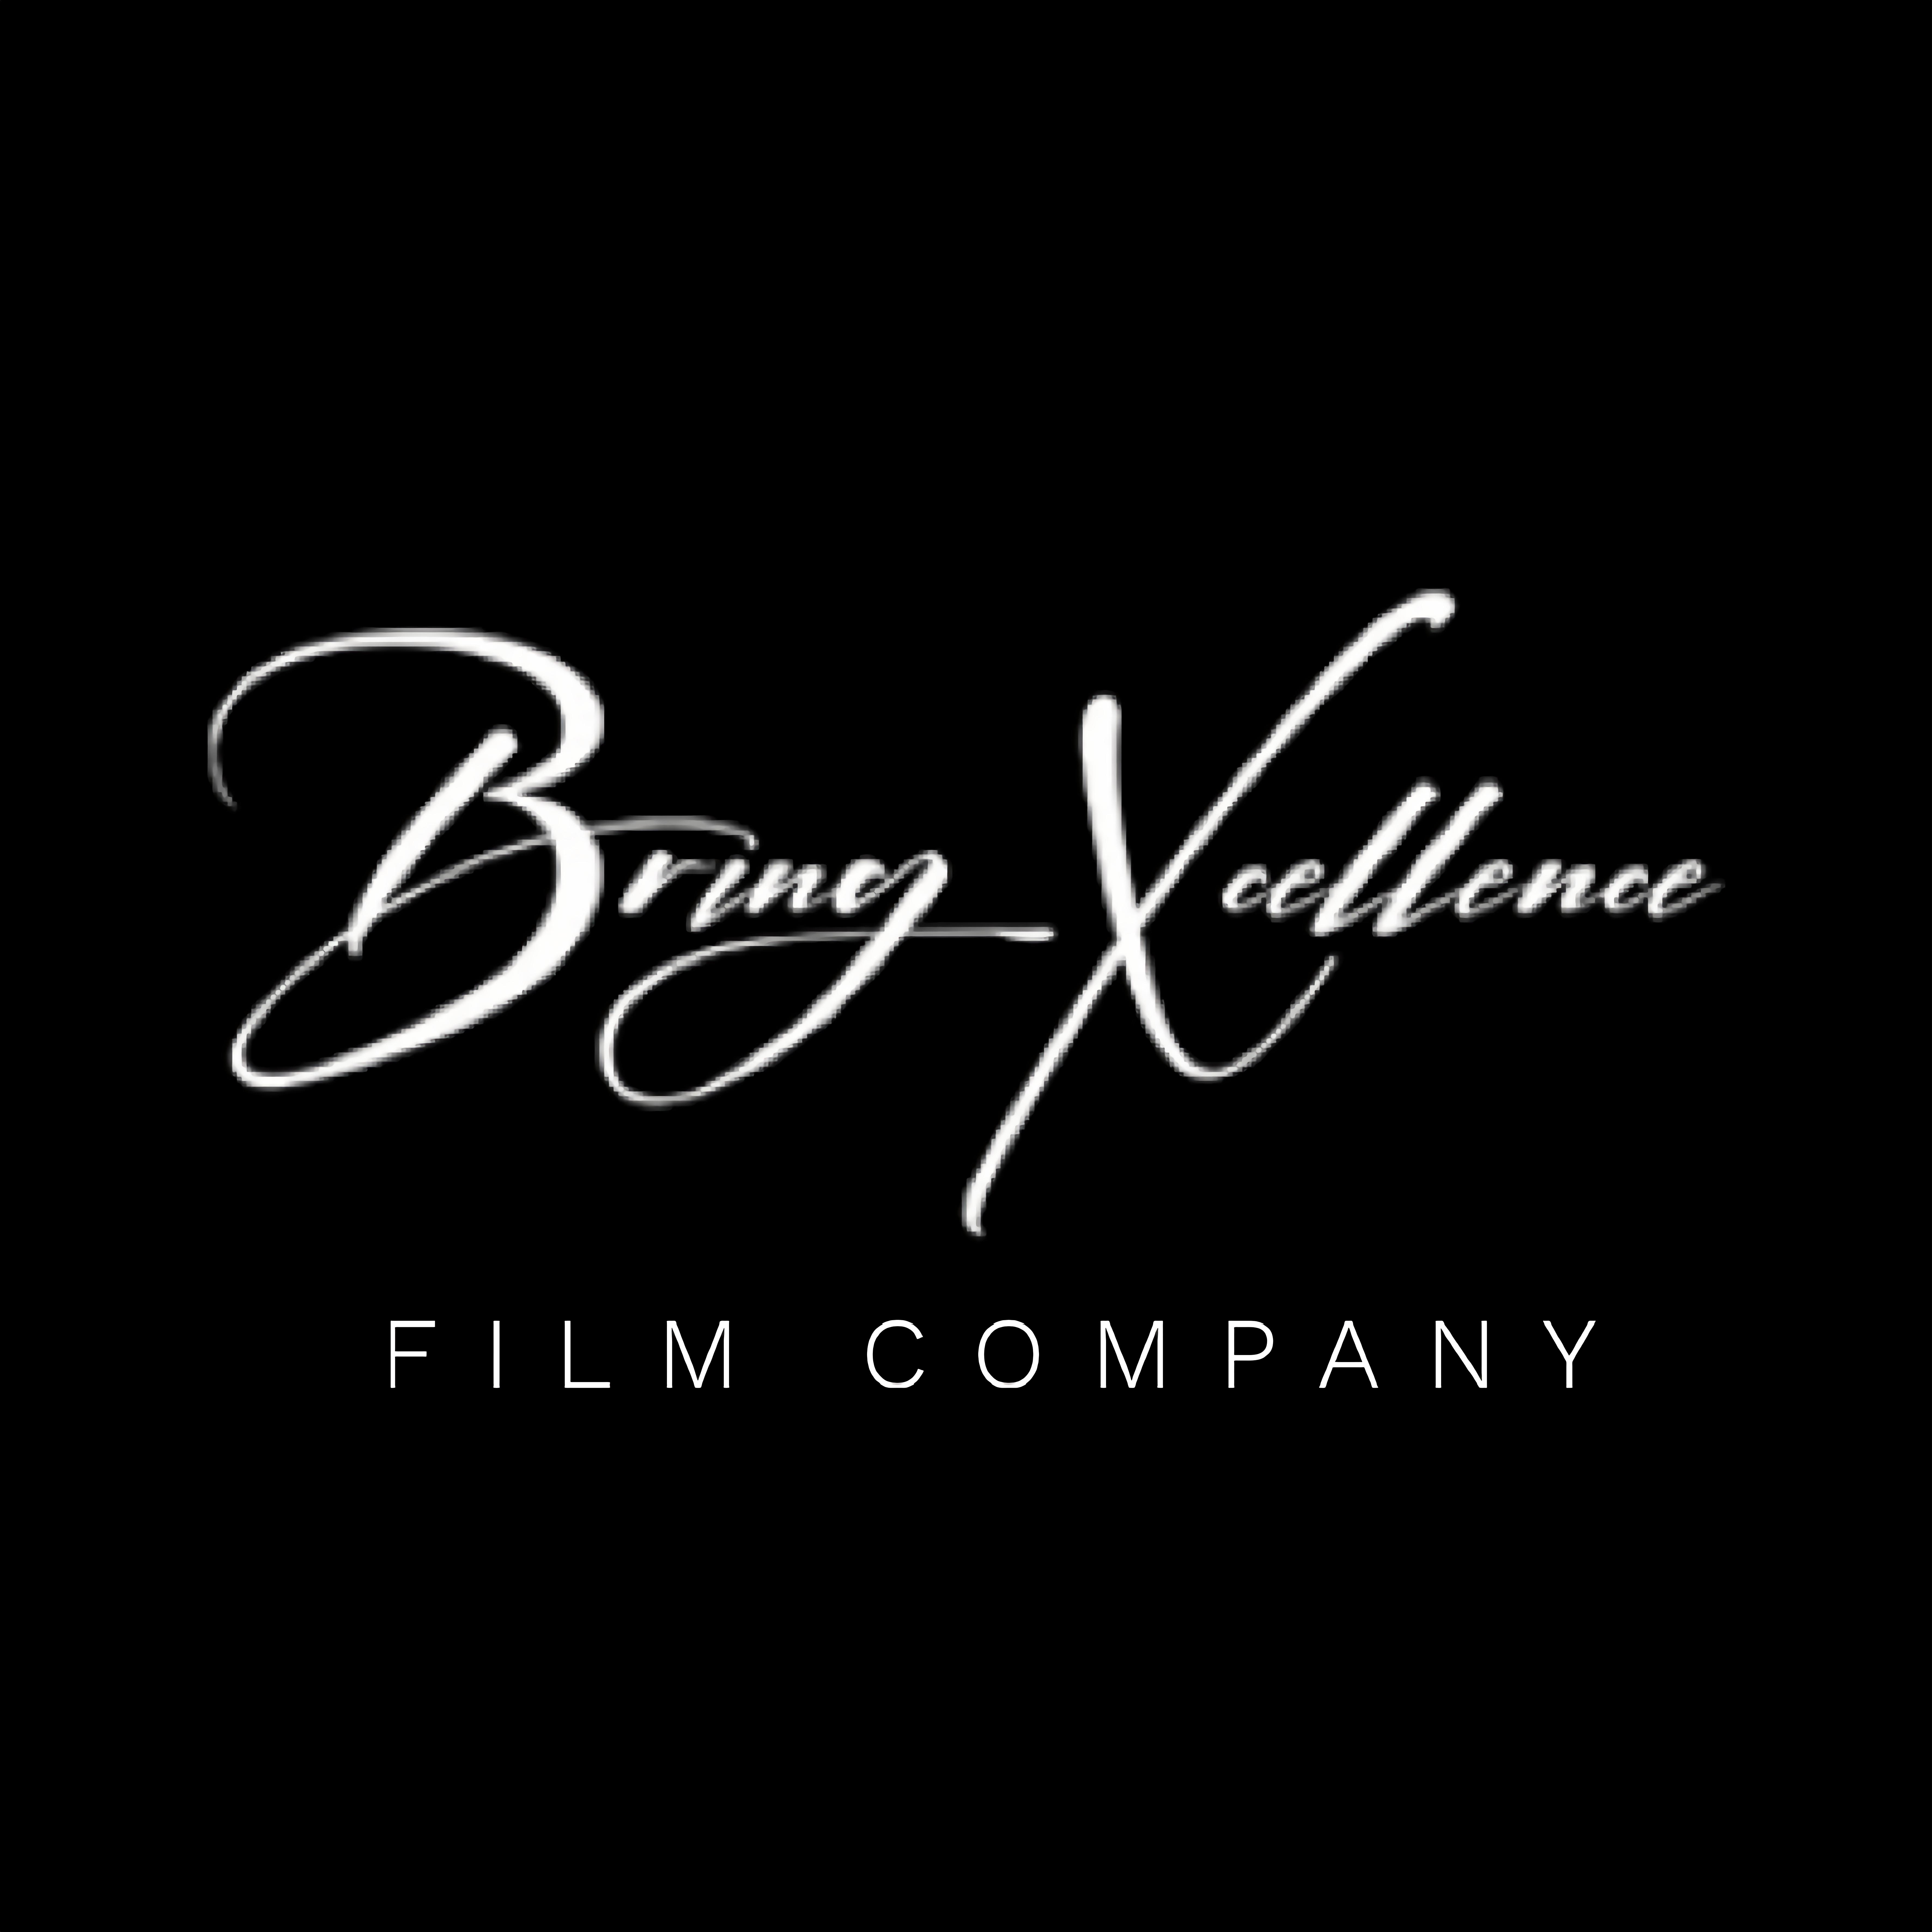 Bring Xcellence Film Company